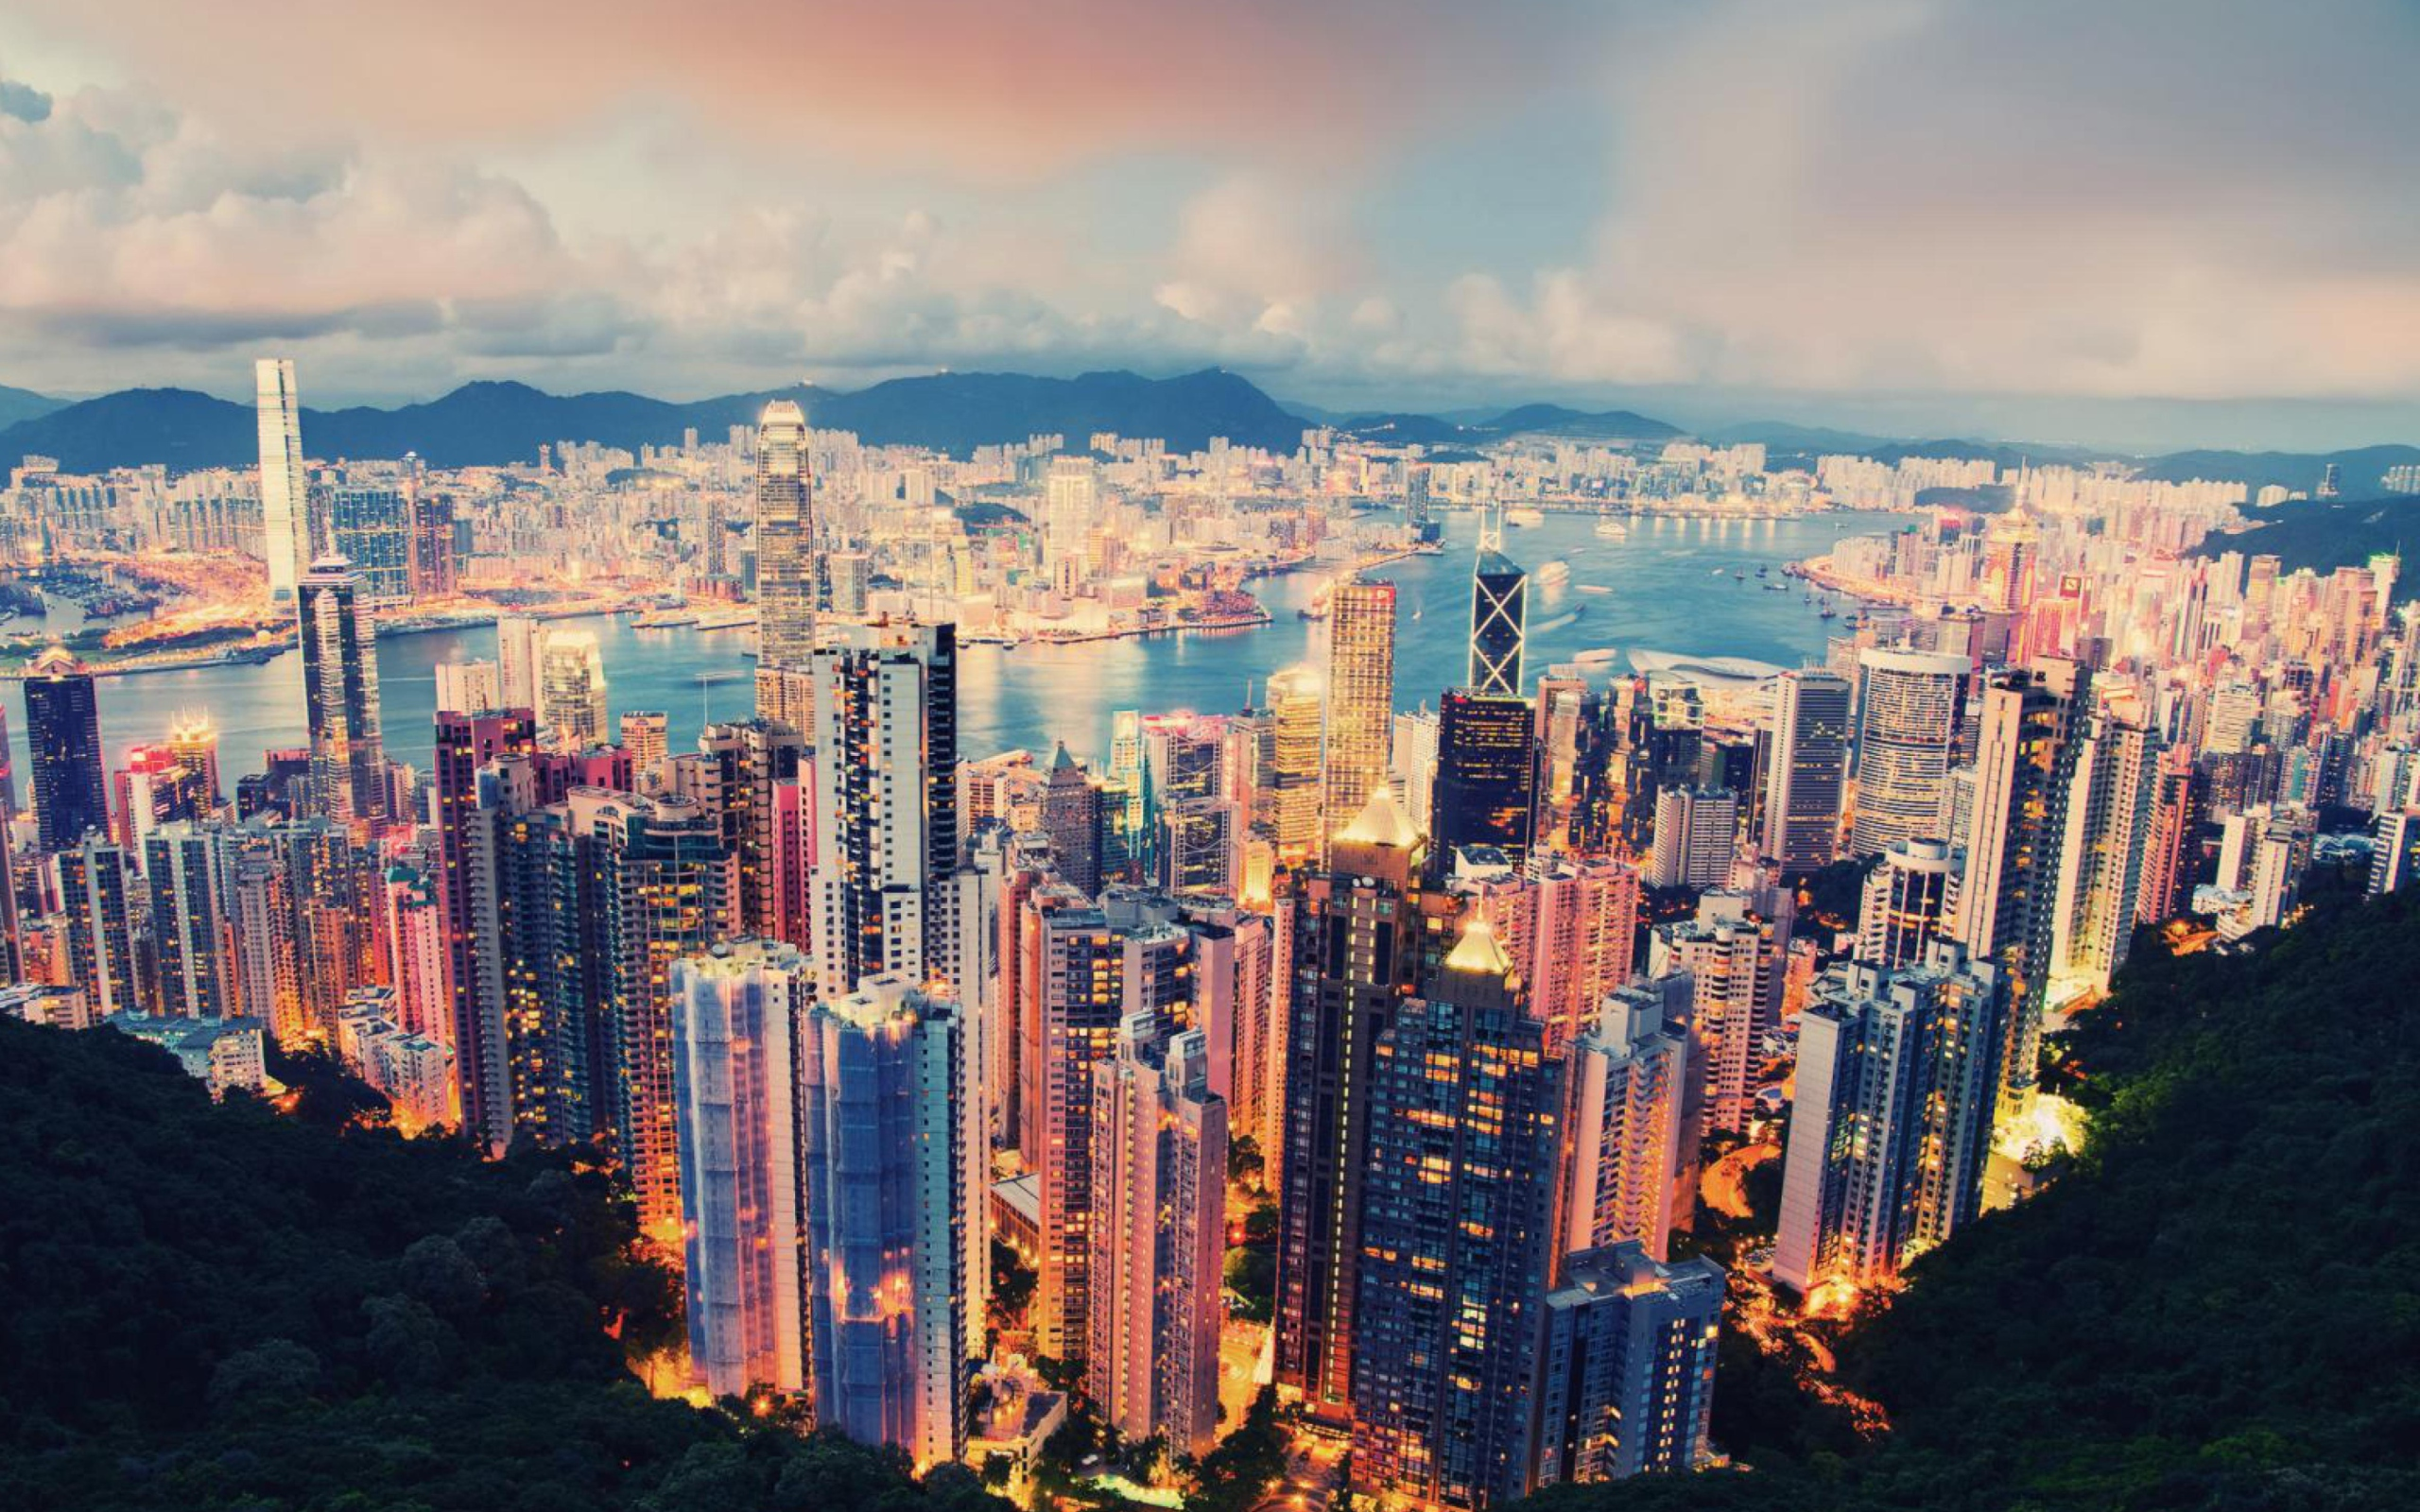 Гонконг архитектура ночь город страны  № 2229787 бесплатно